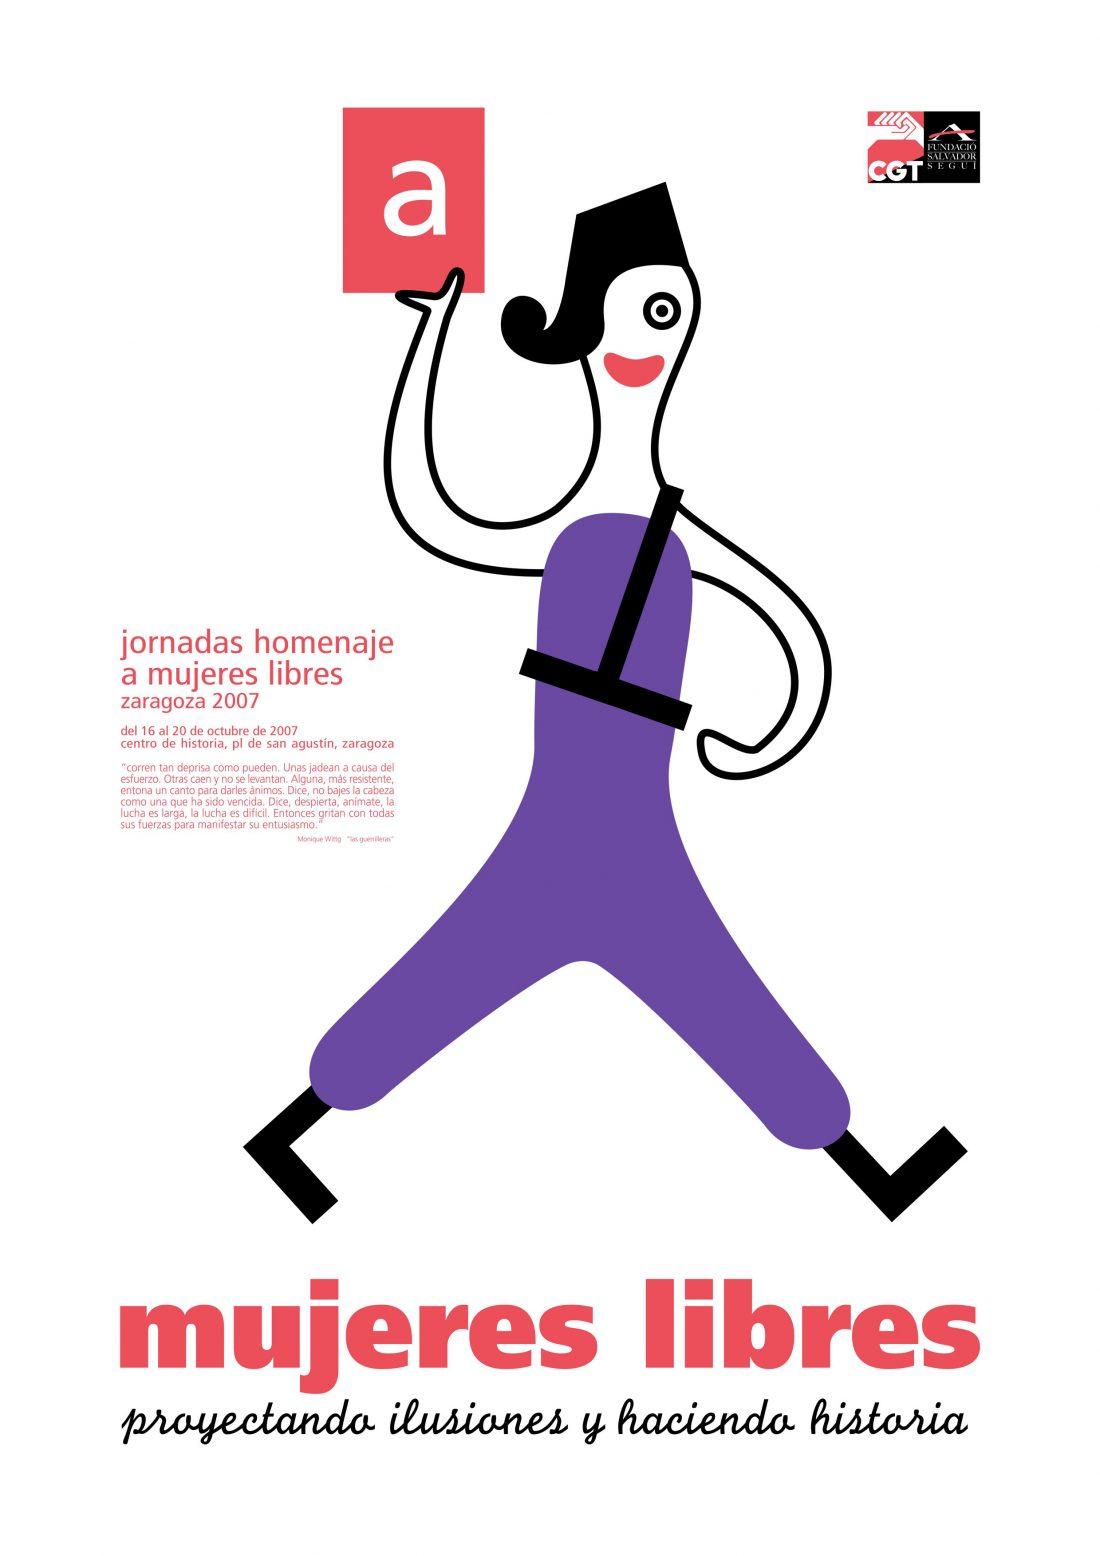 Cartel Jornadas Homenaje Mujeres Libres (Zaragoza 2007)